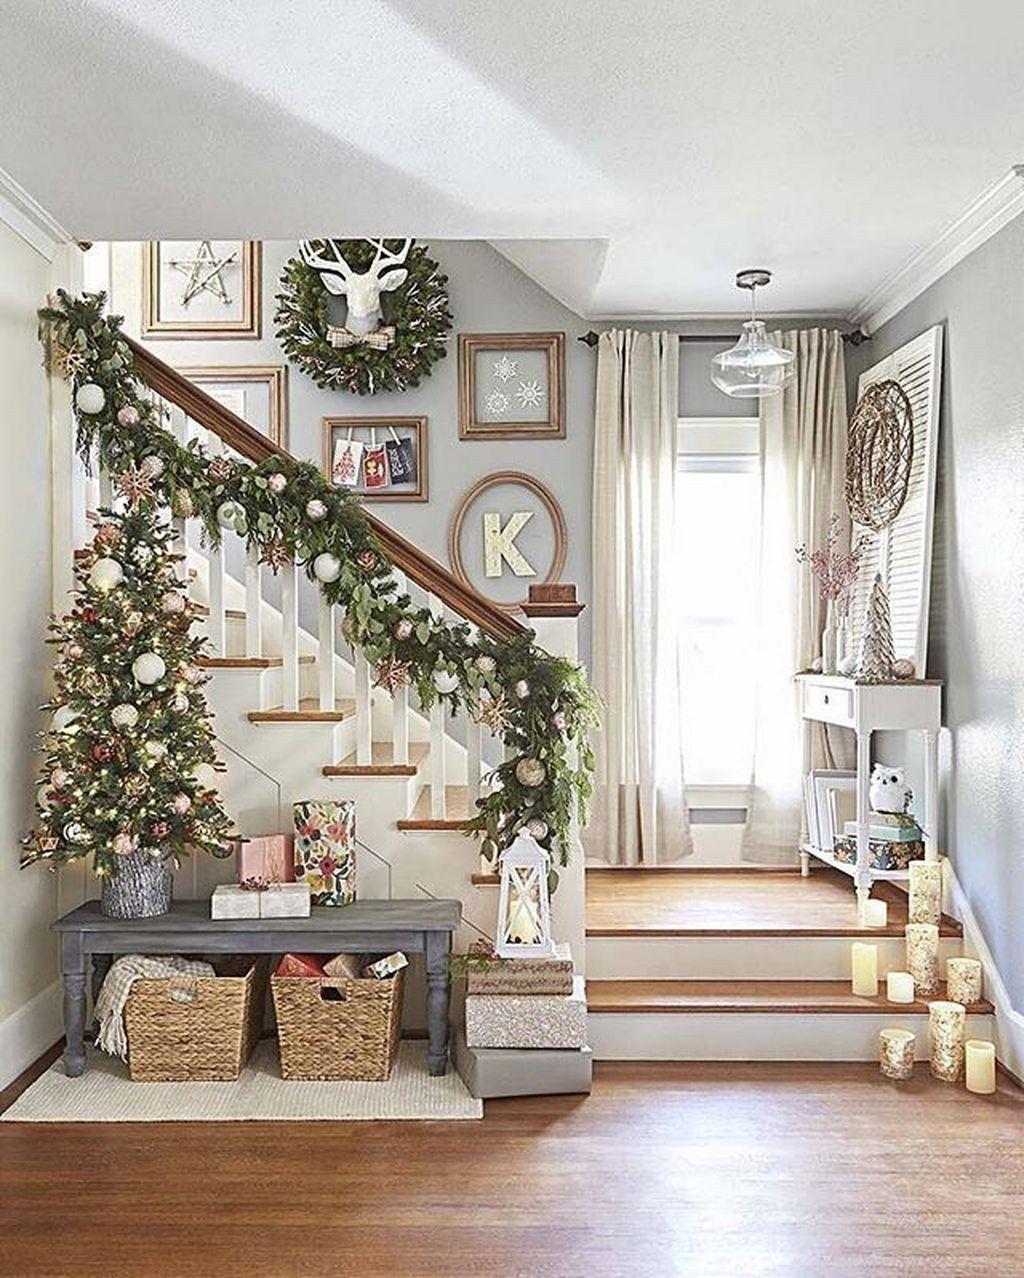 55 Small Apartment Christmas Decor Ideas